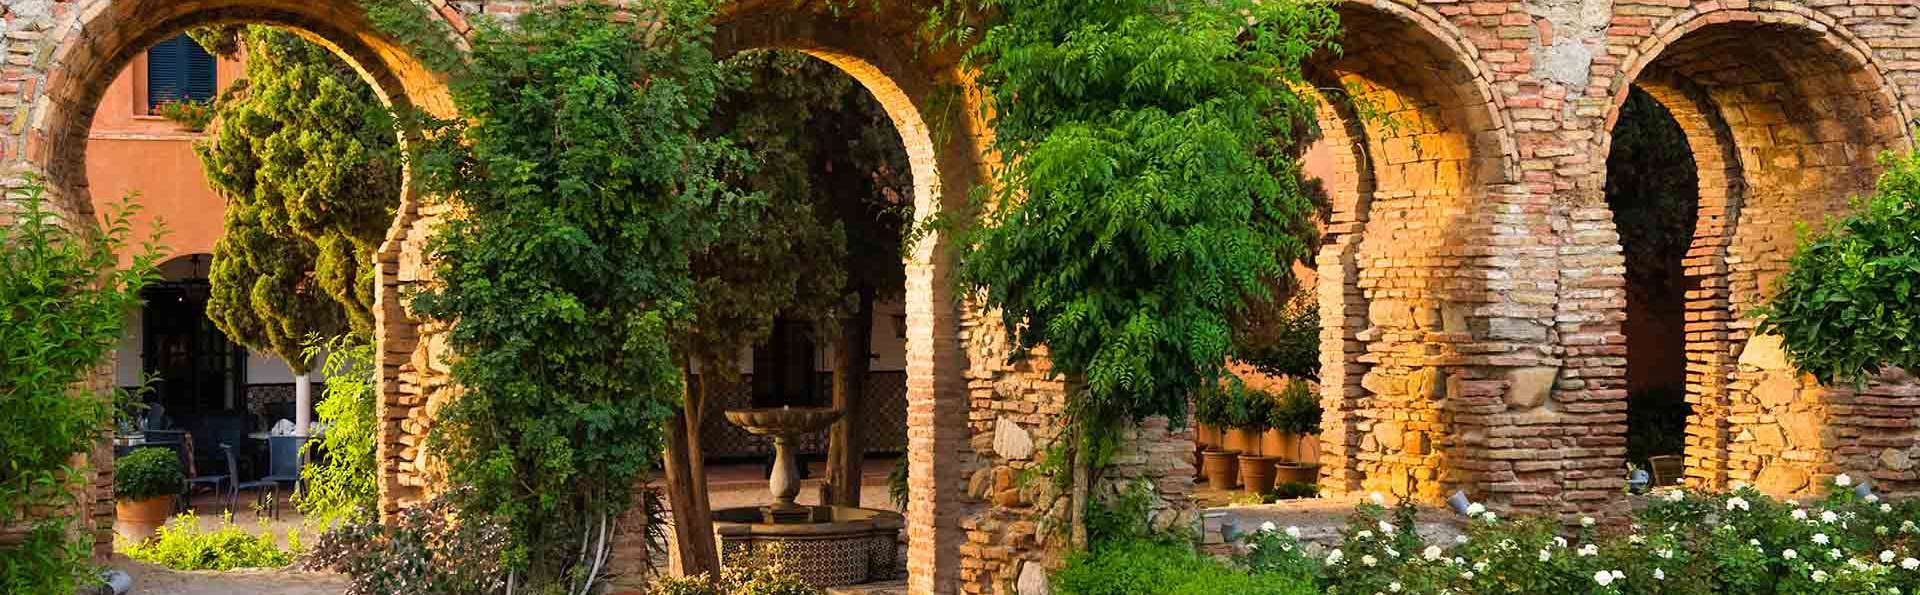 Soho Boutique Castillo de Santa Catalina - EDIT_SB_CASTILLO_STA_CATALINA_-_EXTERIORES_12.jpg